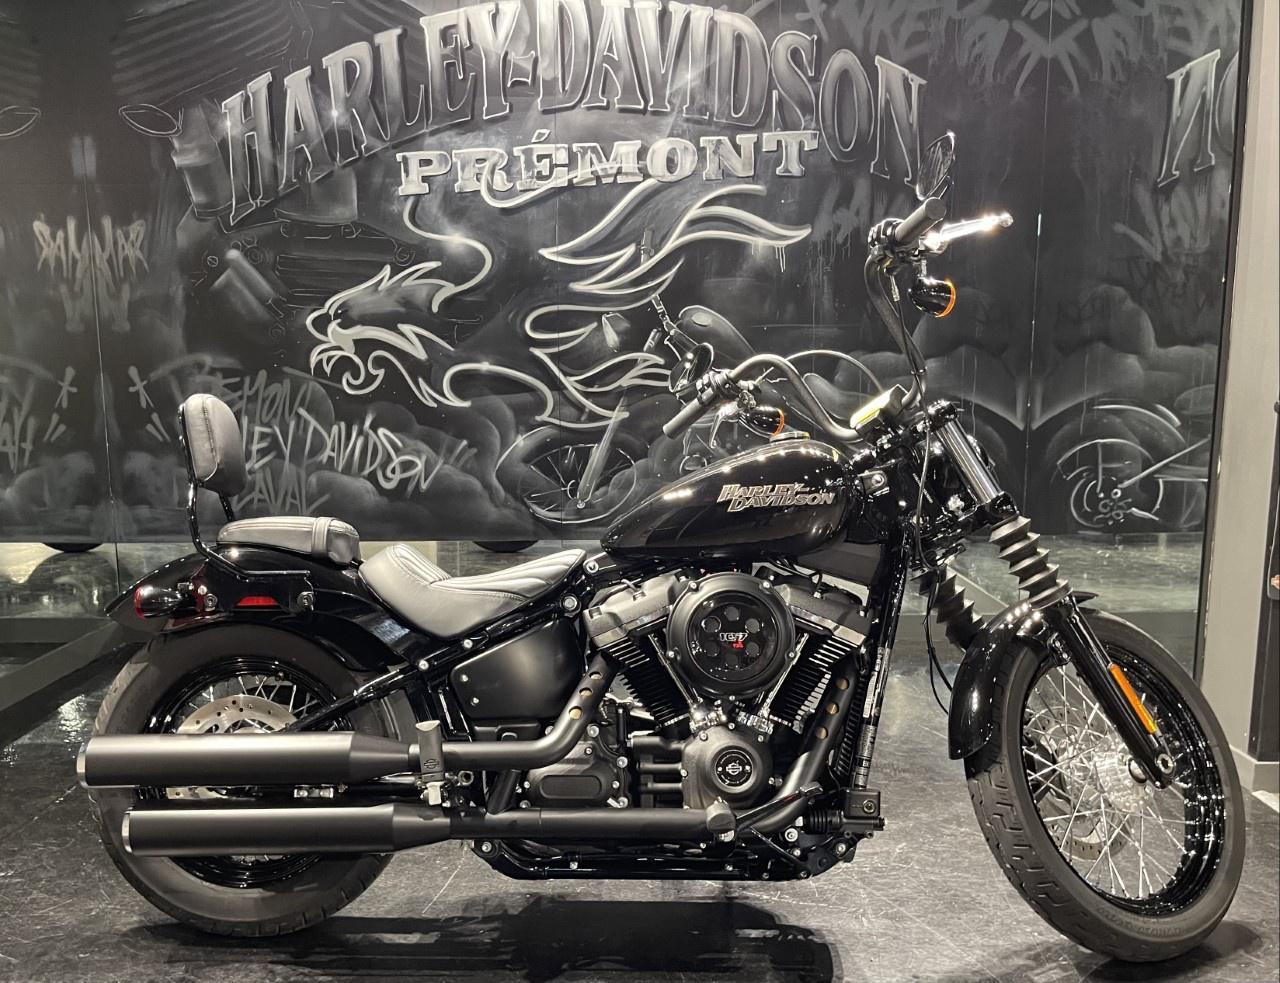 2018 Harley-Davidson FXBB Street bob